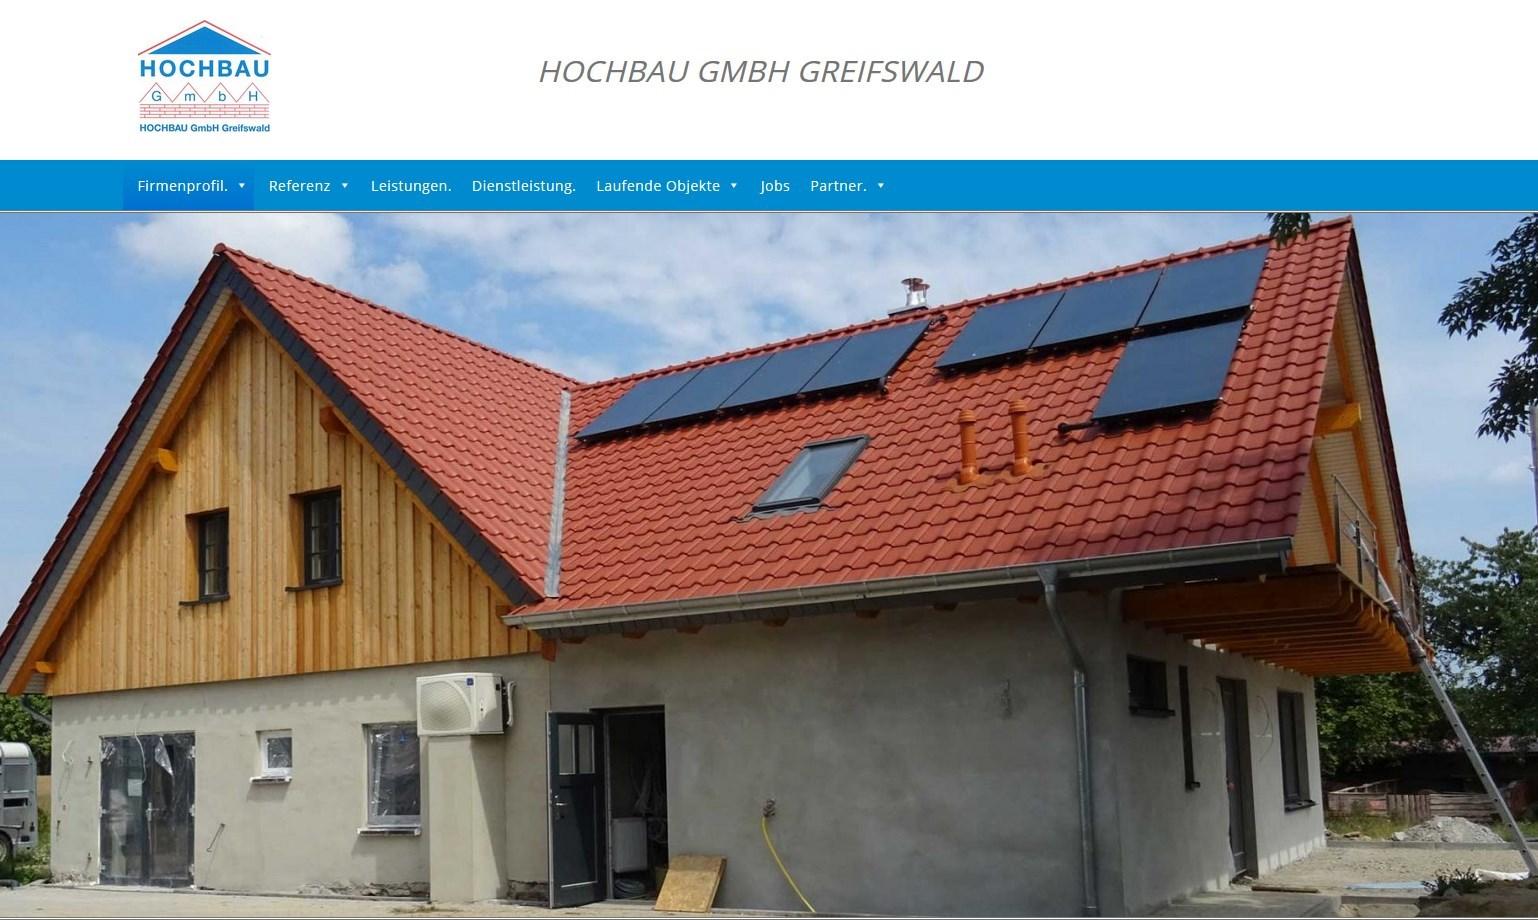 Hochbau GmbH Greifswald   Design